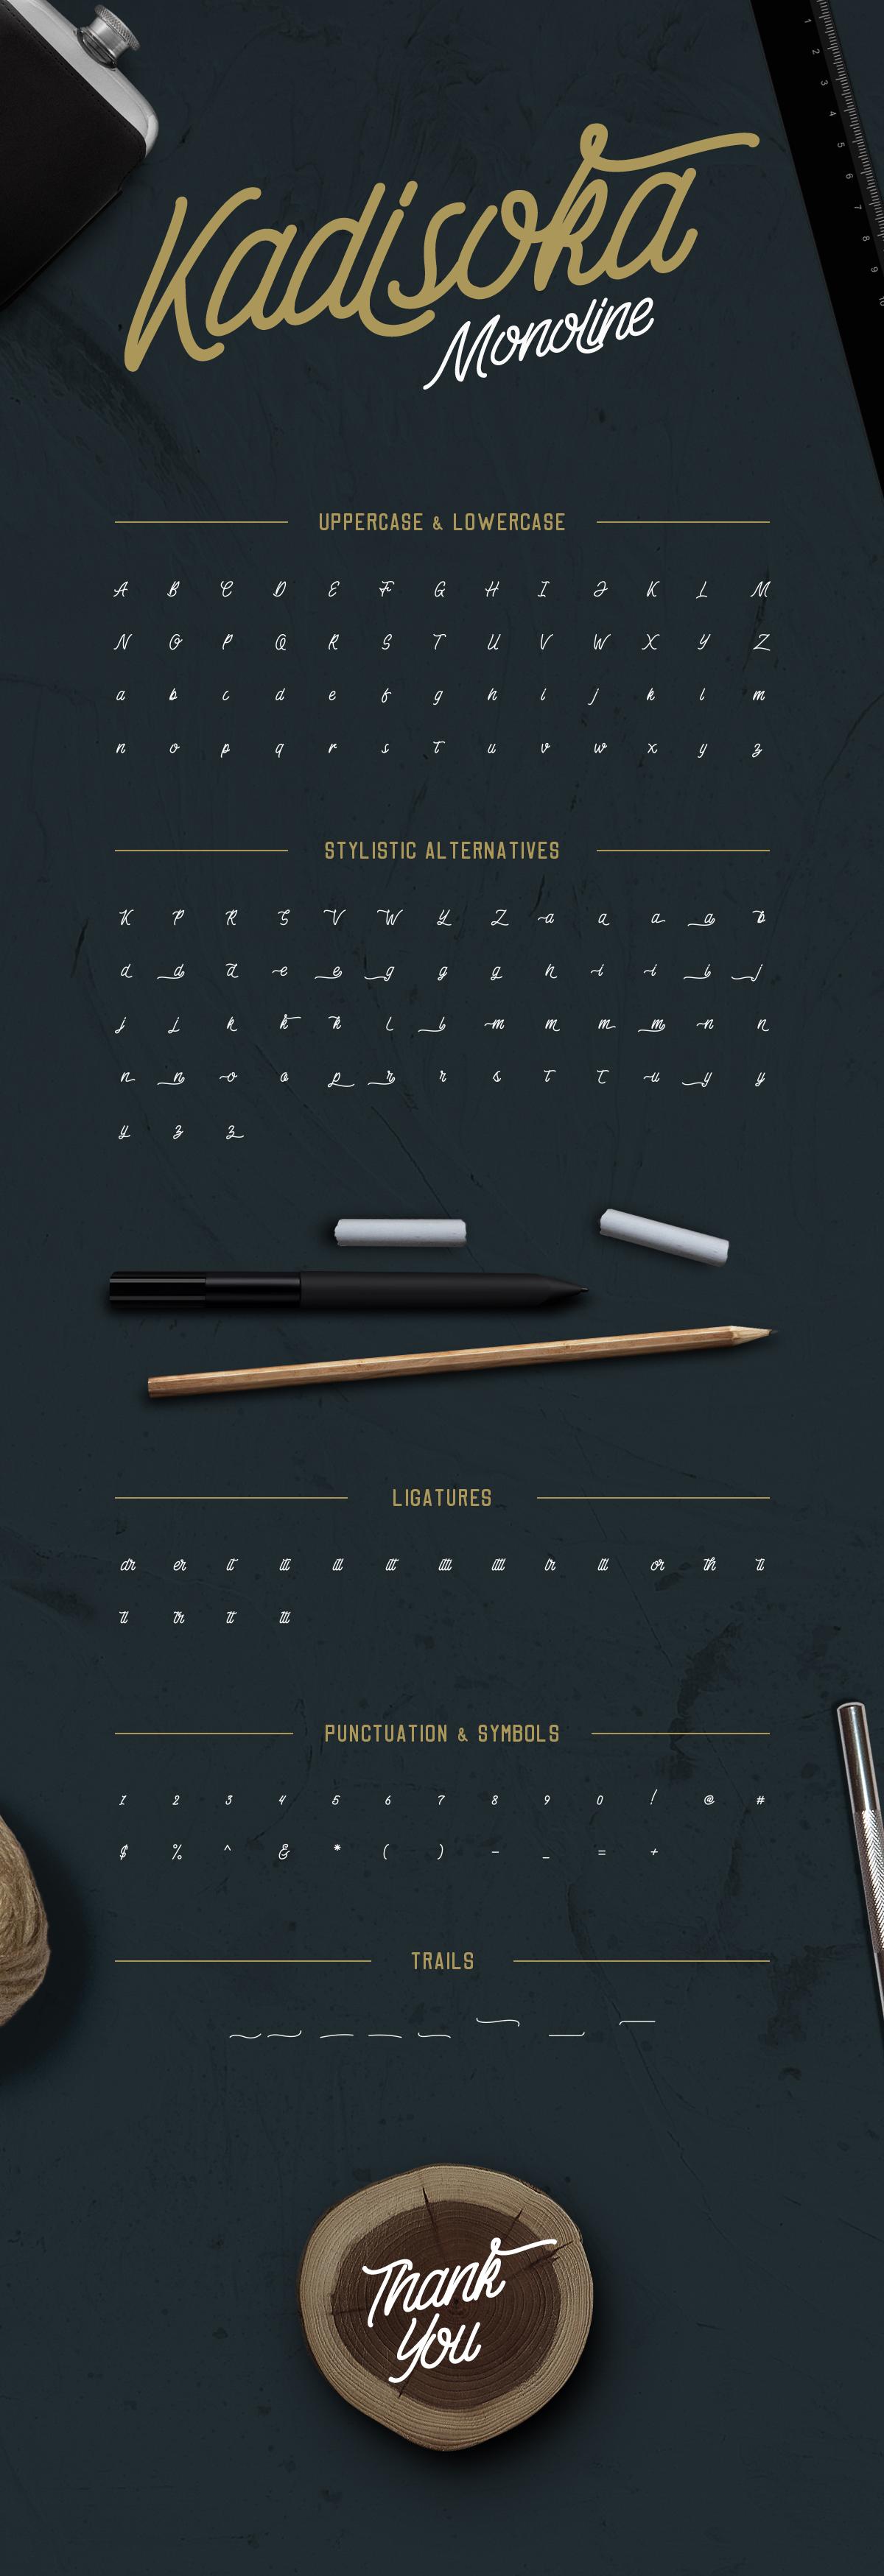 Download Kadisoka Font Pack by letterhend   GraphicRiver